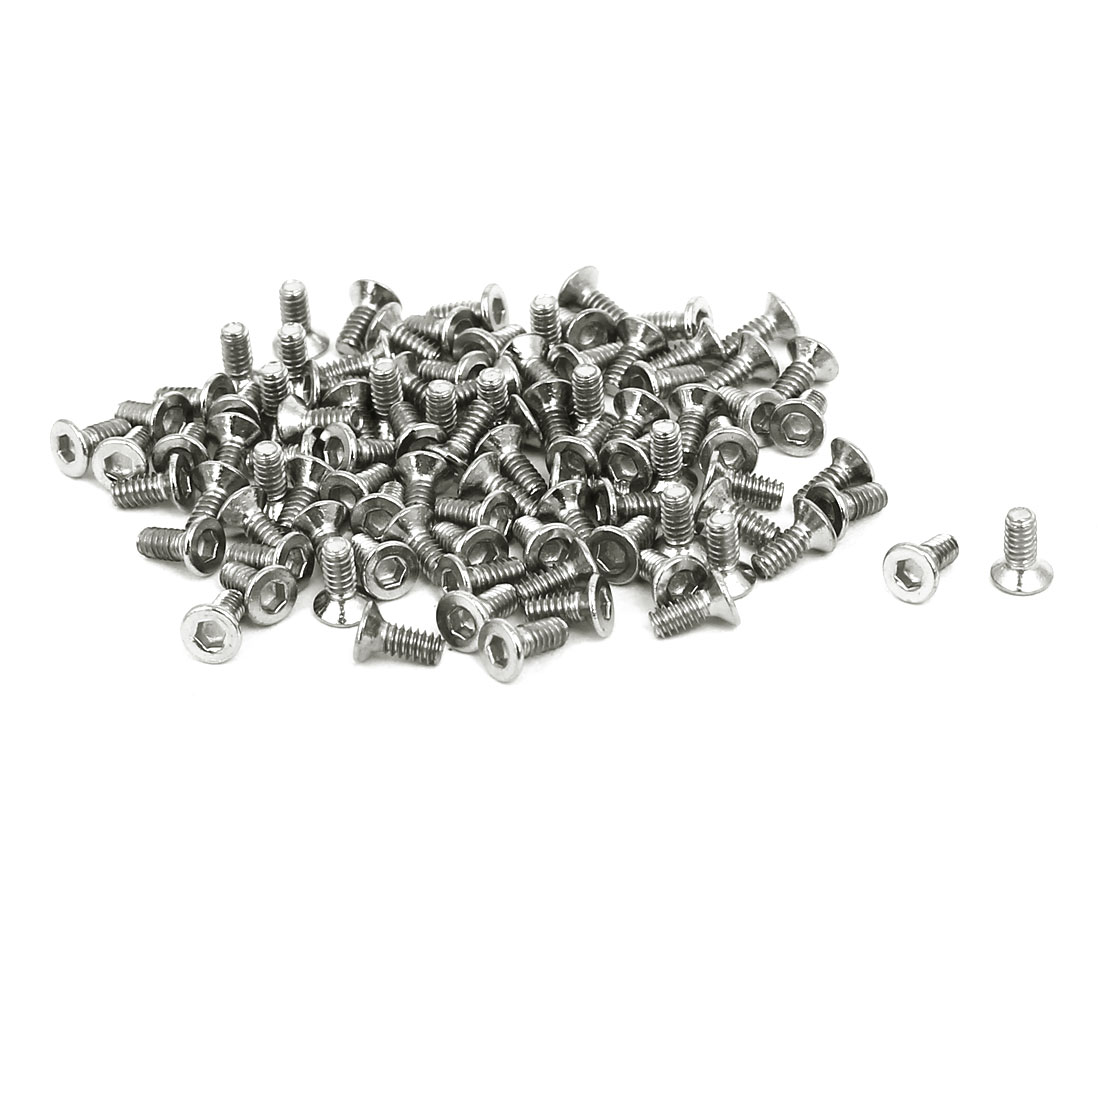 M1.6x4mm Grade 10.9 Countersunk Flat Head Hex Socket Cap Screw Silver Tone 50pcs